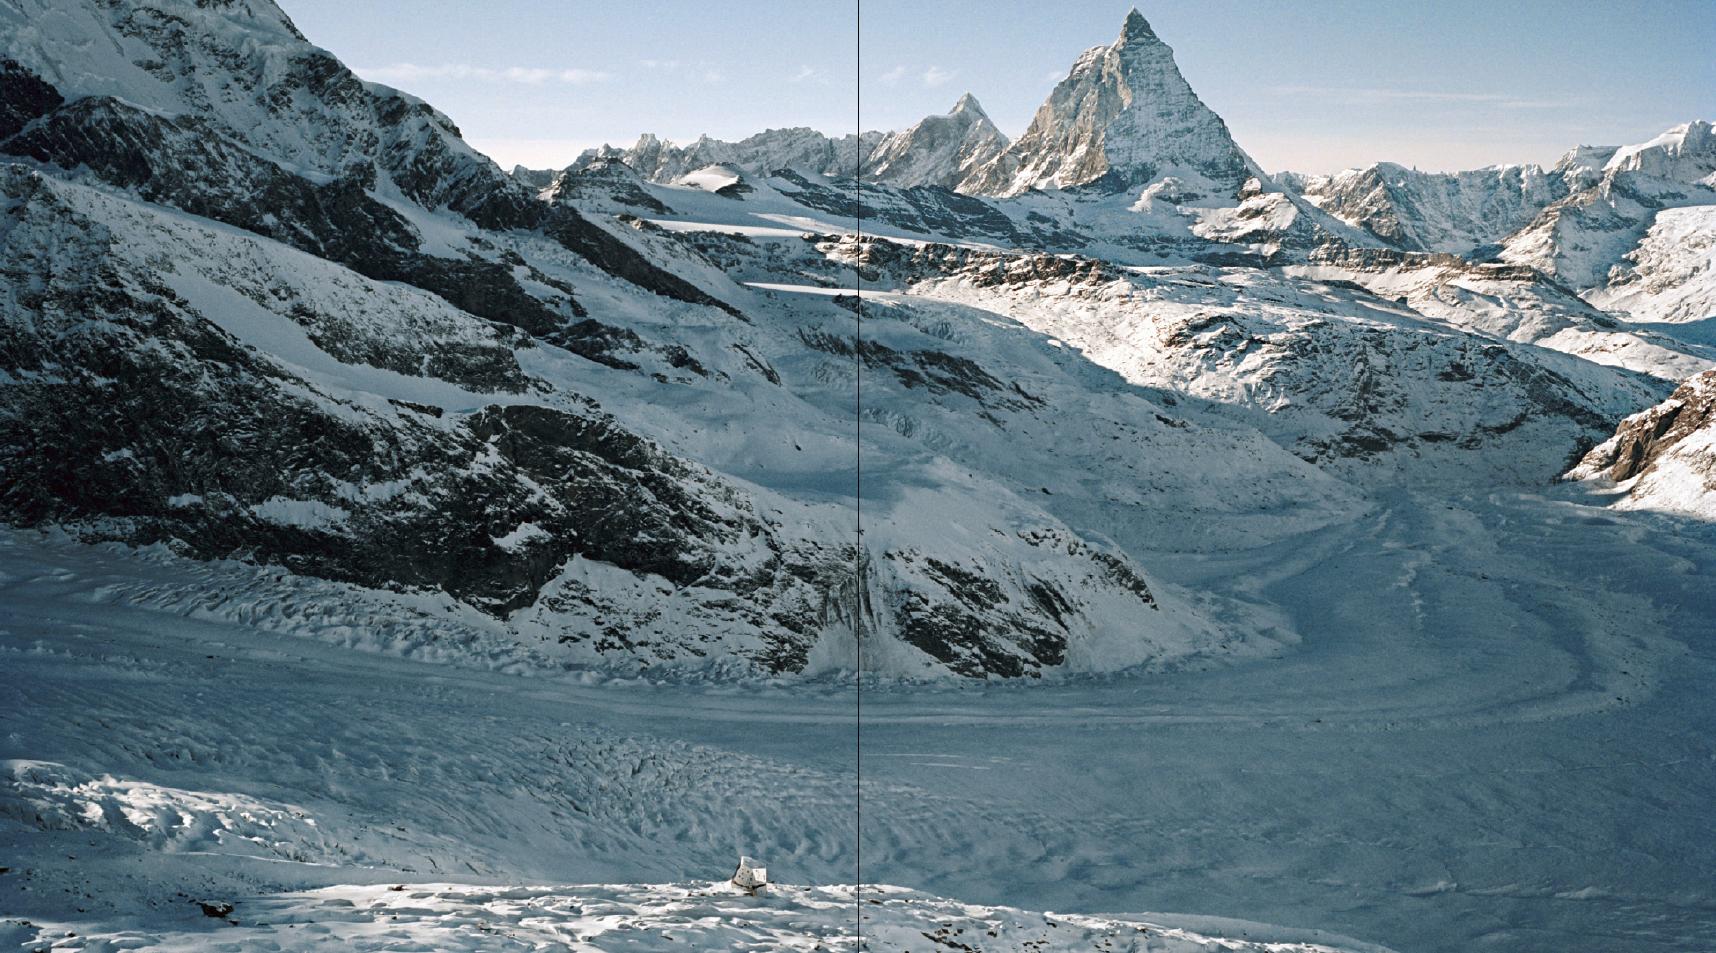 Impressiun dal cudesch Amurs: Chamanna Monte Rosa, Zermatt.